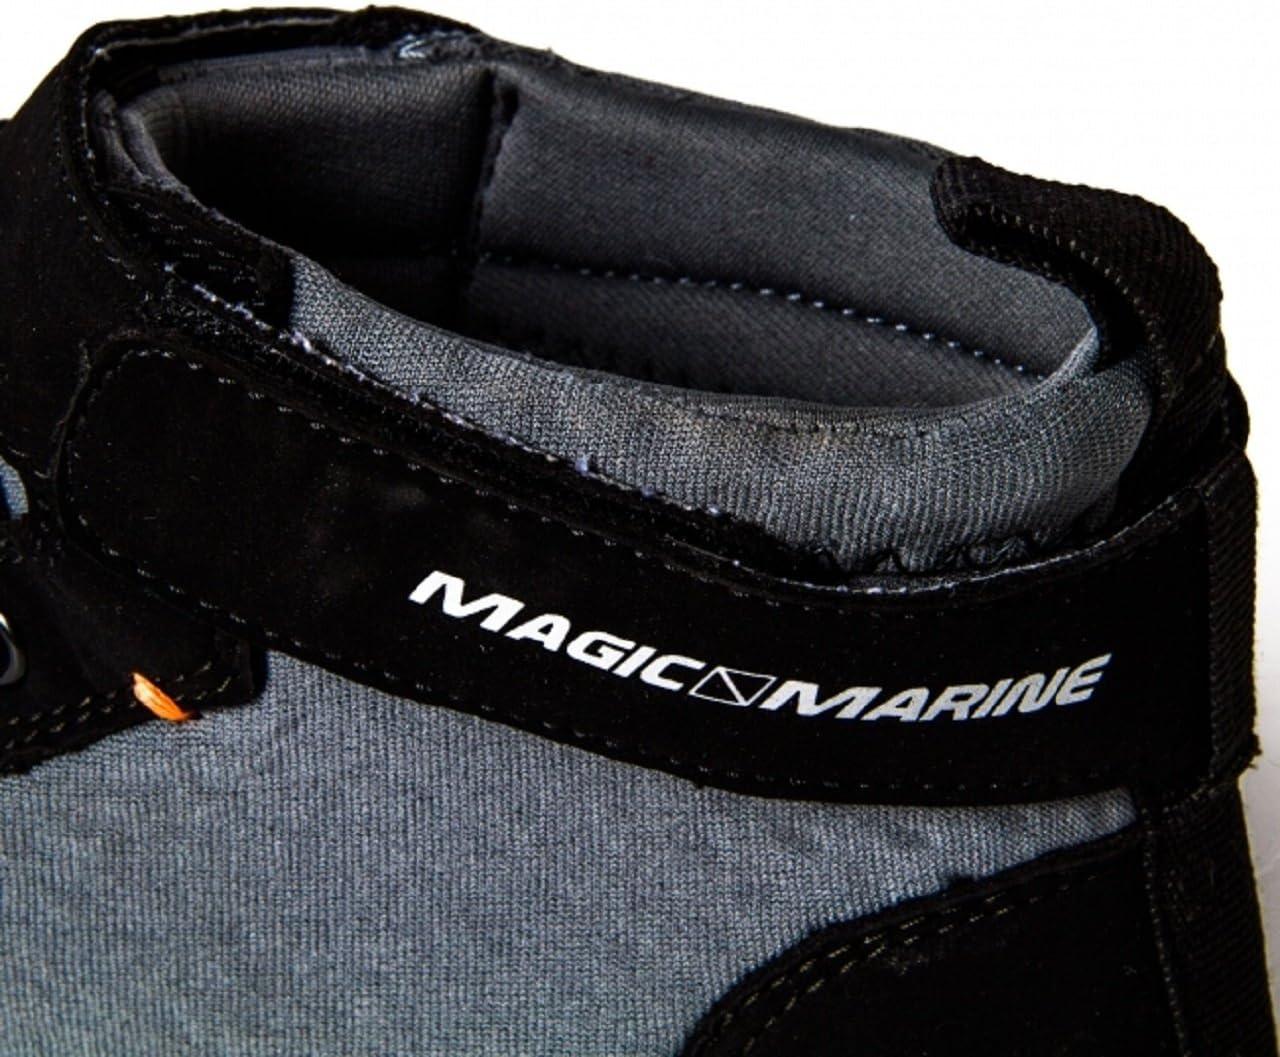 Magic Marine Damen Herren Neopren Sneaker High Deckies Bootsschuhe